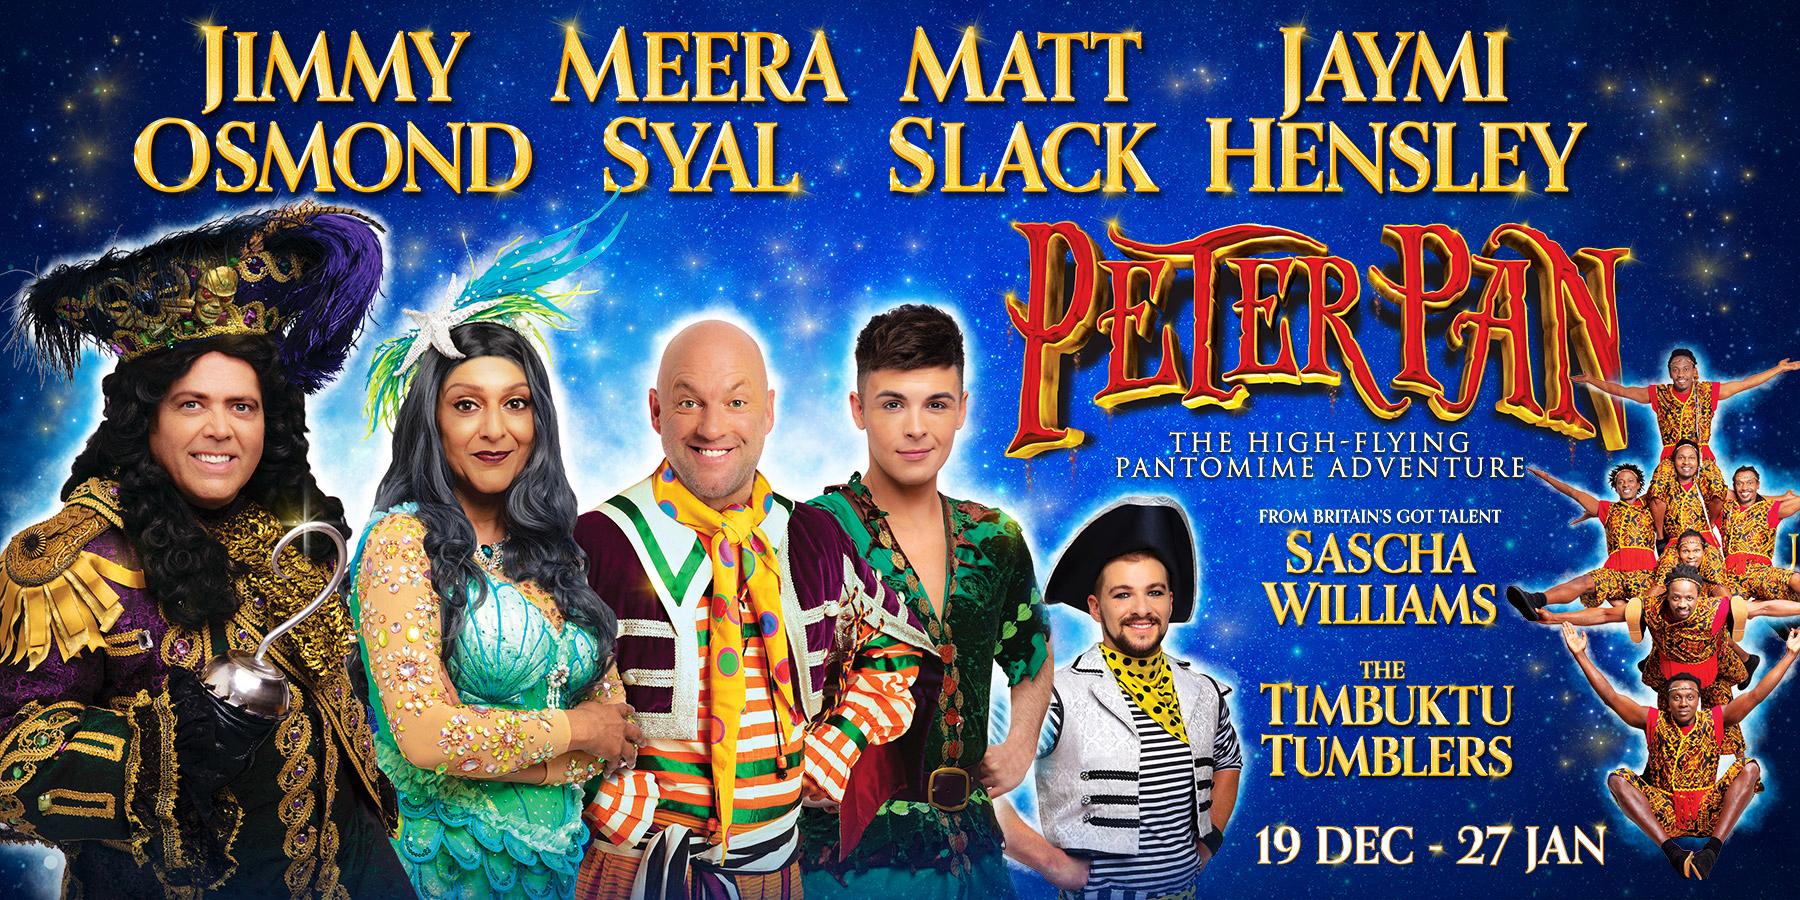 Resultado de imagen de Peter Pan pantomime at the Birmingham Hippodrome jimmy osmond